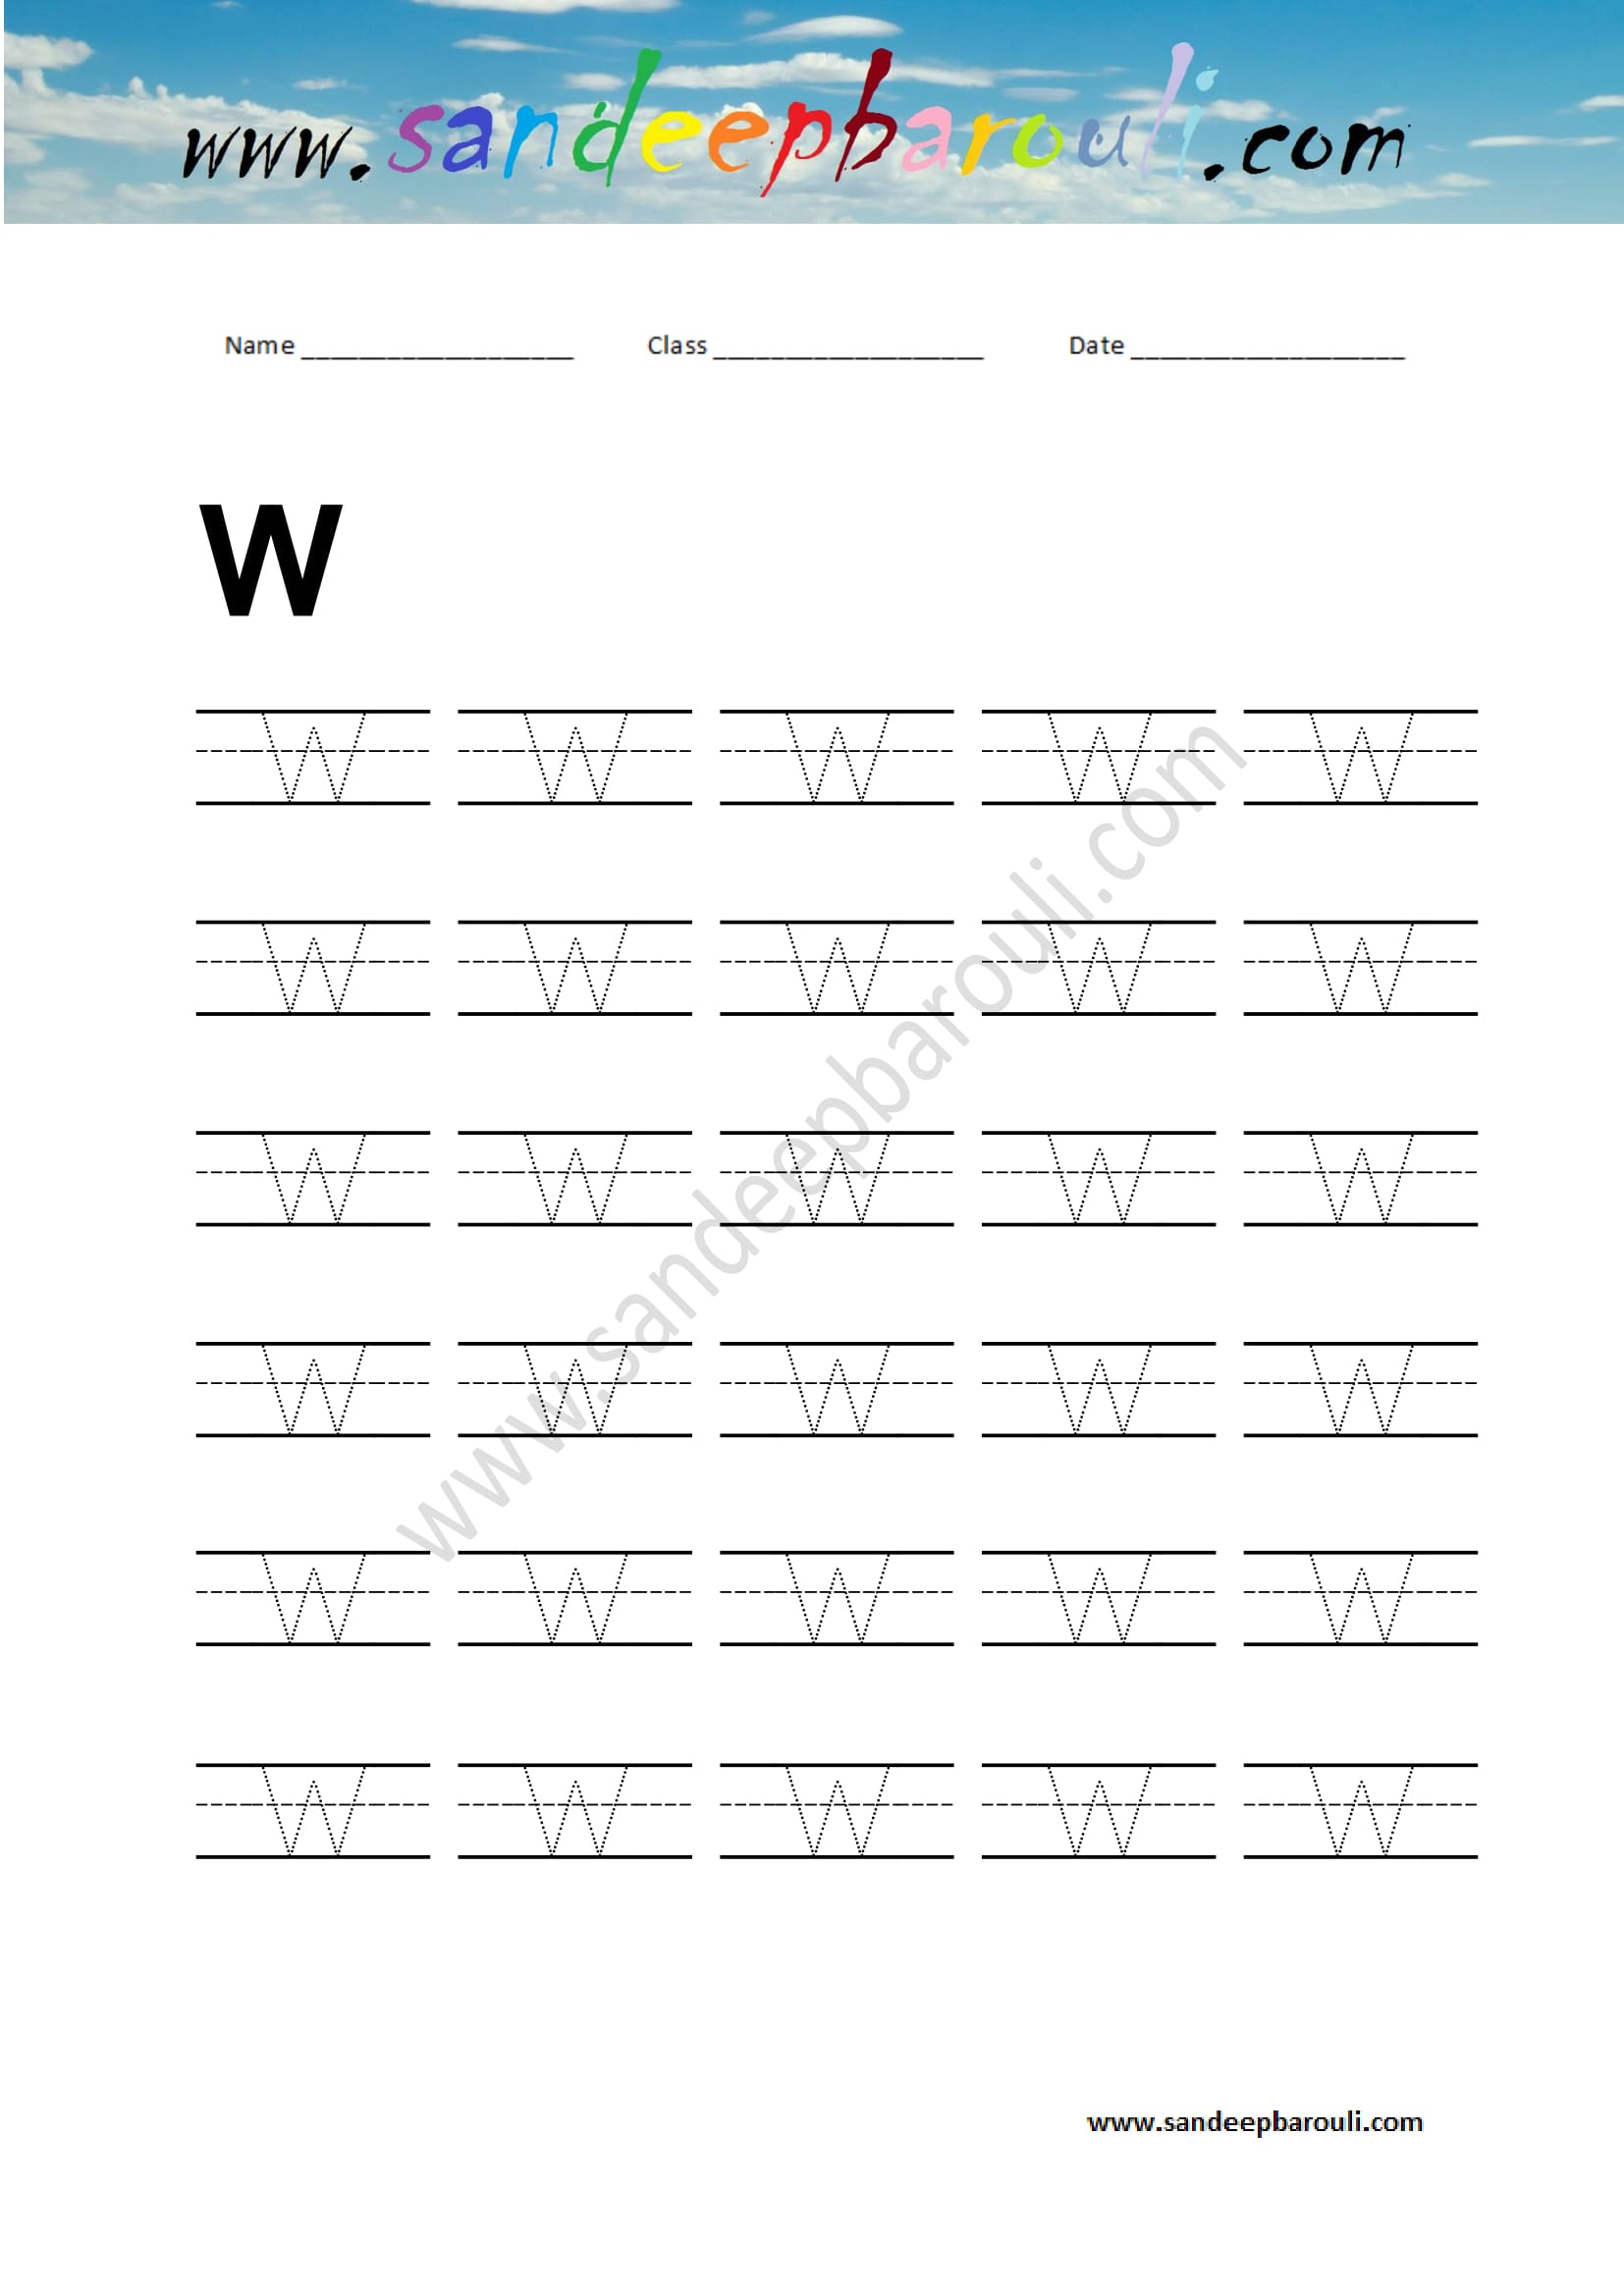 Handwriting Practice Letter W Sandeepbarouli